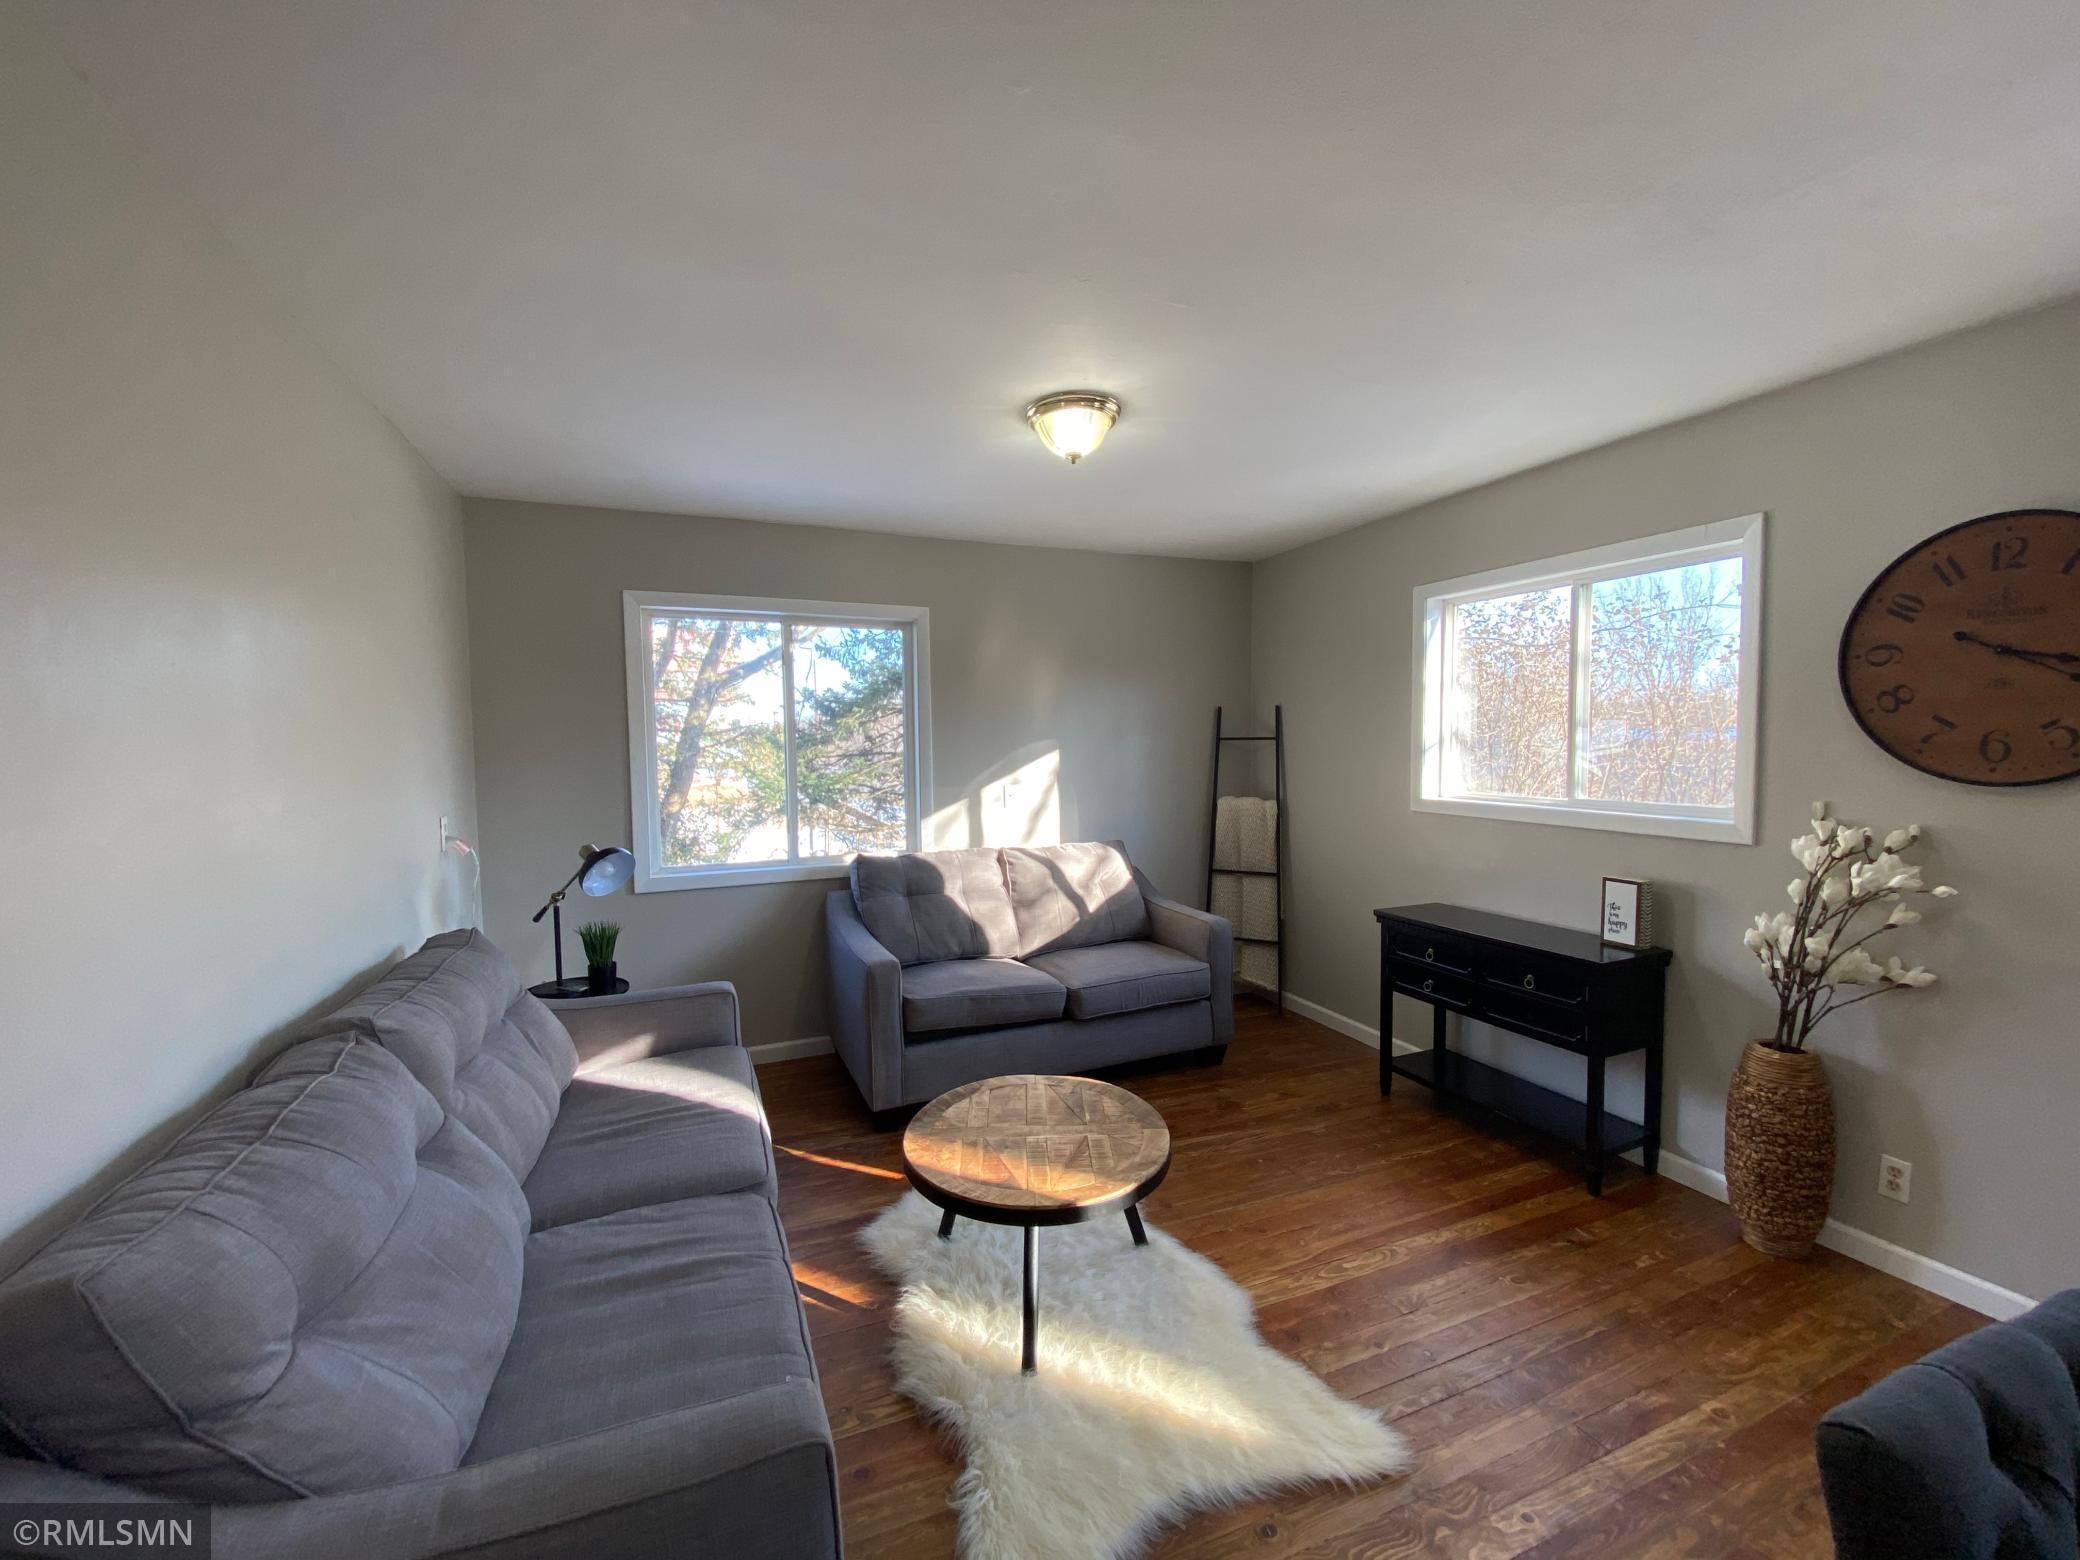 1325 US Highway 8 Property Photo - Balsam Lake, WI real estate listing